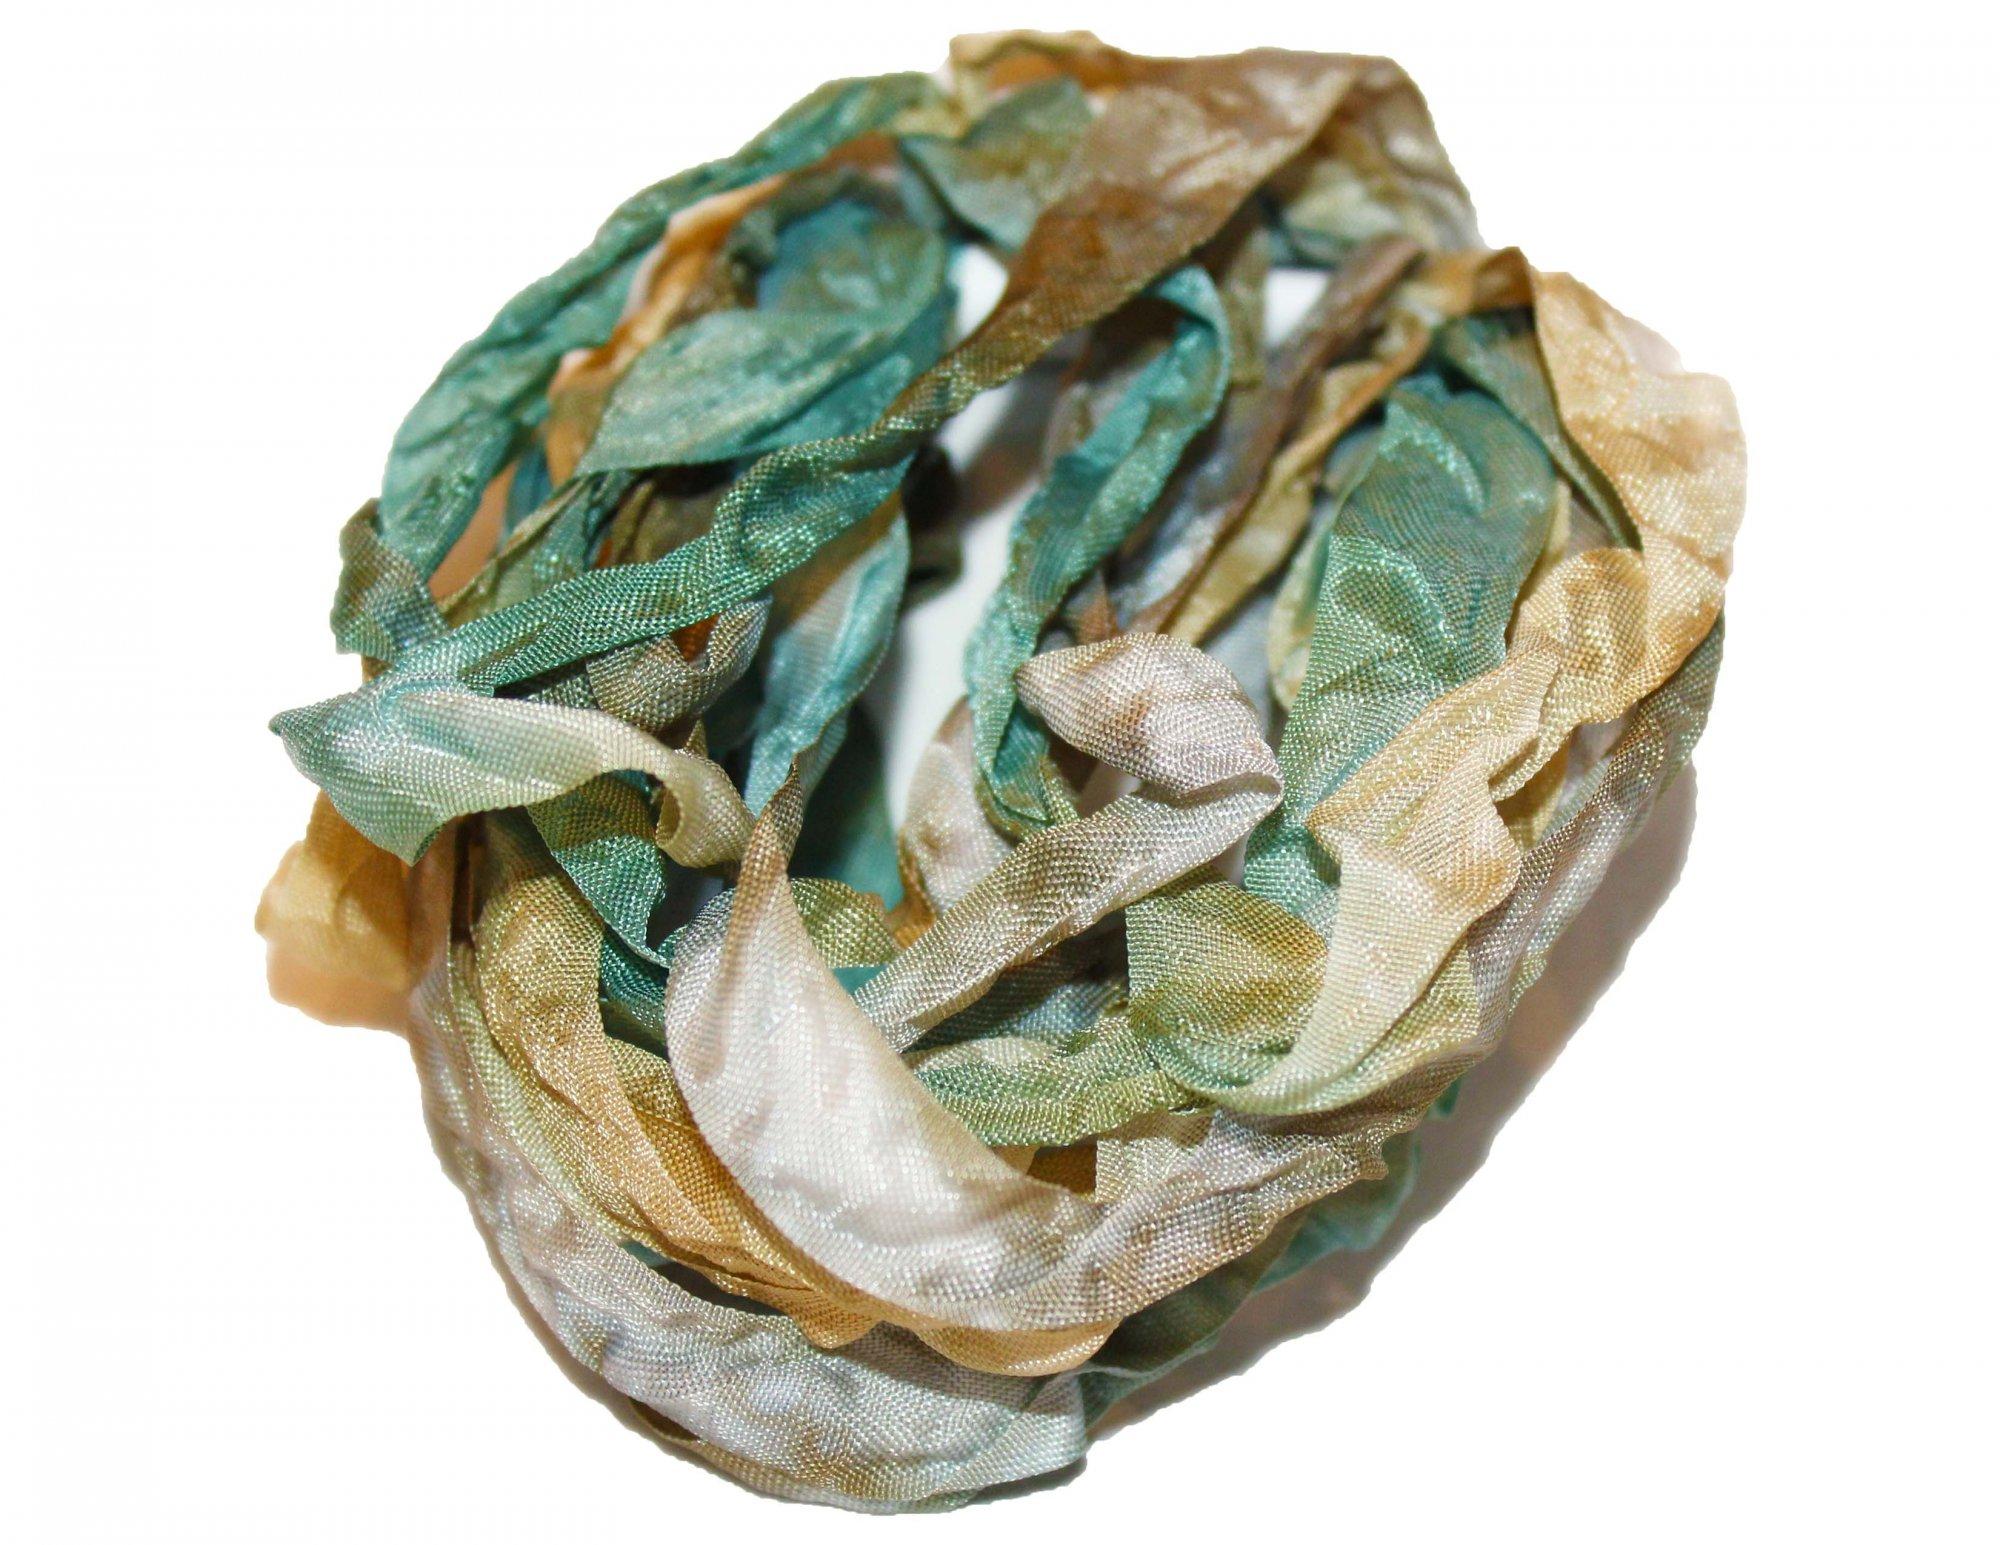 Muddy Waters Hand-Dyed Rayon Seam Binding 5yds